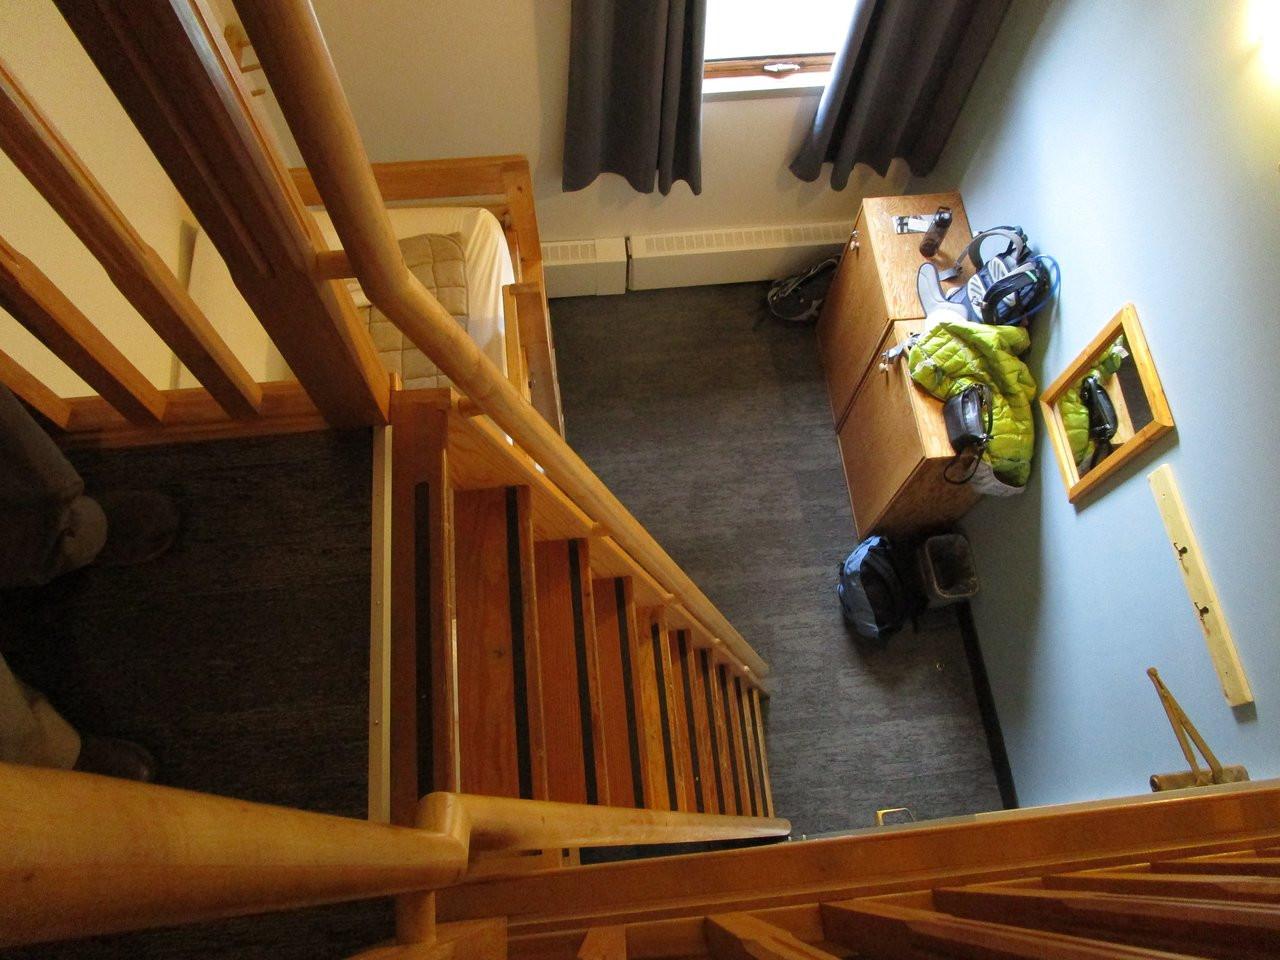 hardwood flooring under $3.00 of hi lake louise alpine centre updated 2018 prices hostel reviews throughout hi lake louise alpine centre updated 2018 prices hostel reviews alberta tripadvisor